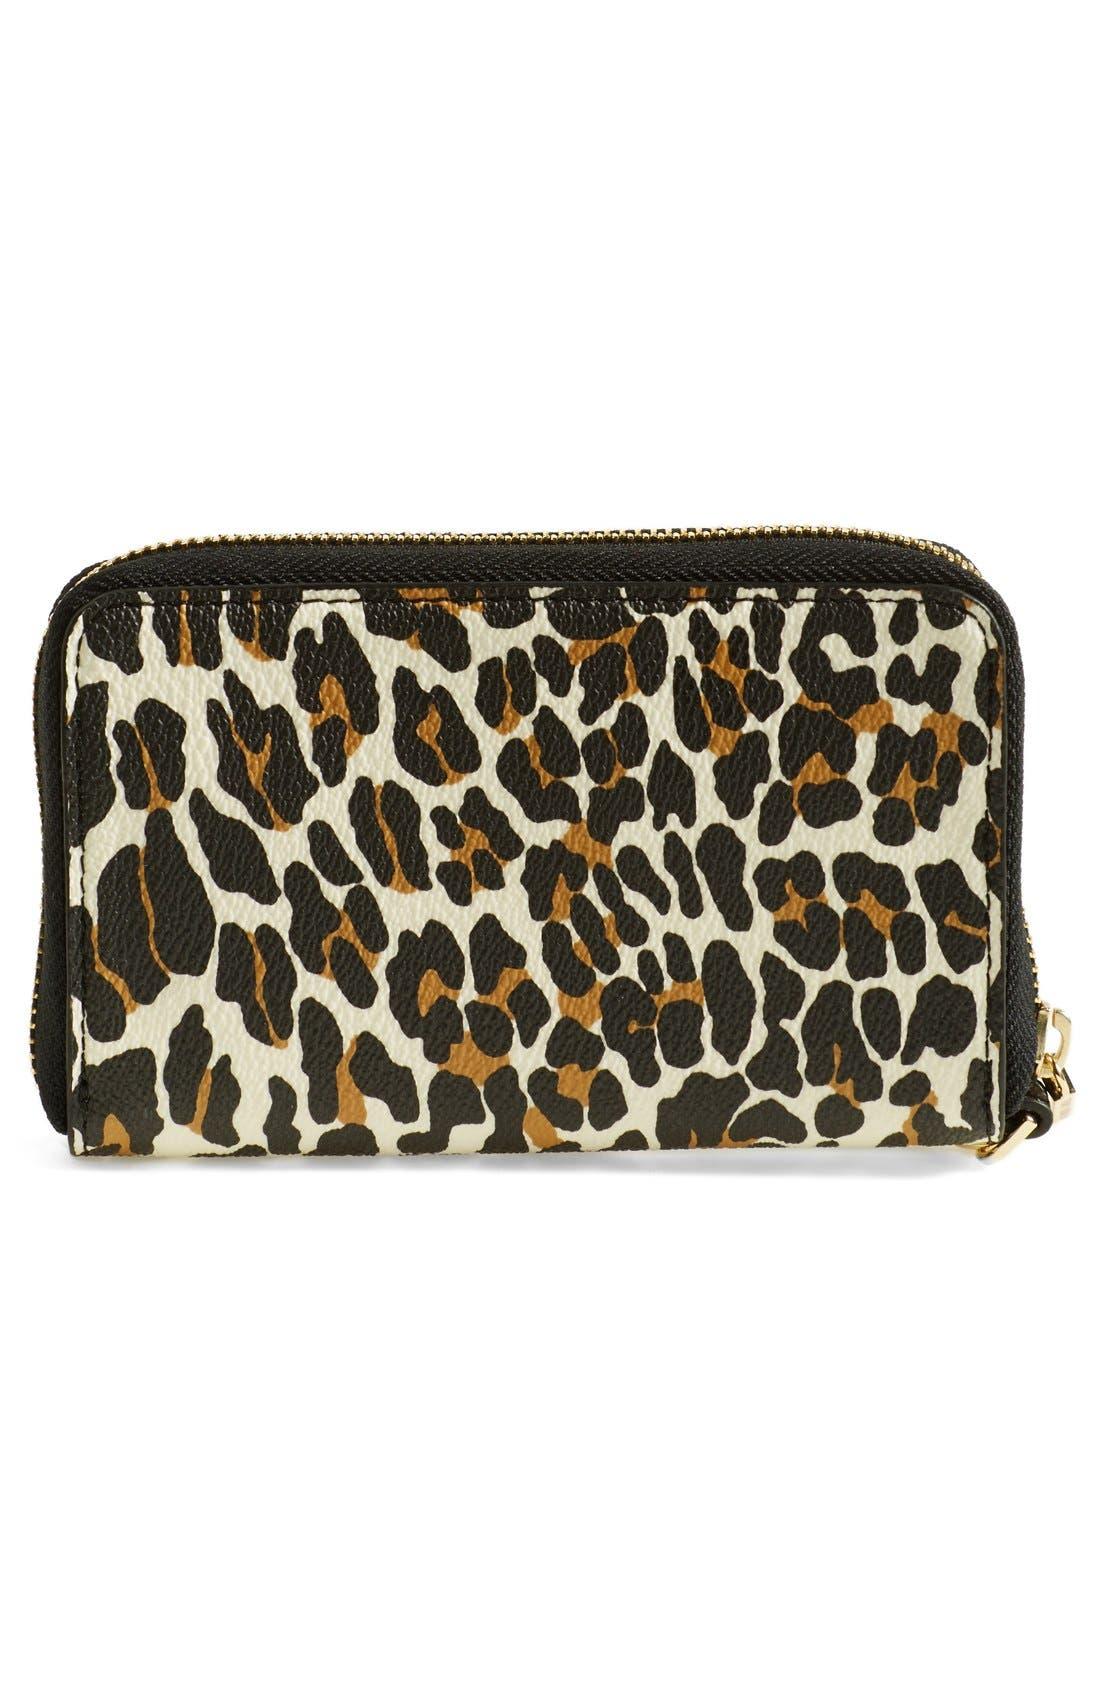 Alternate Image 3  - Tory Burch 'Plaque' Leopard Print Smartphone Wristlet